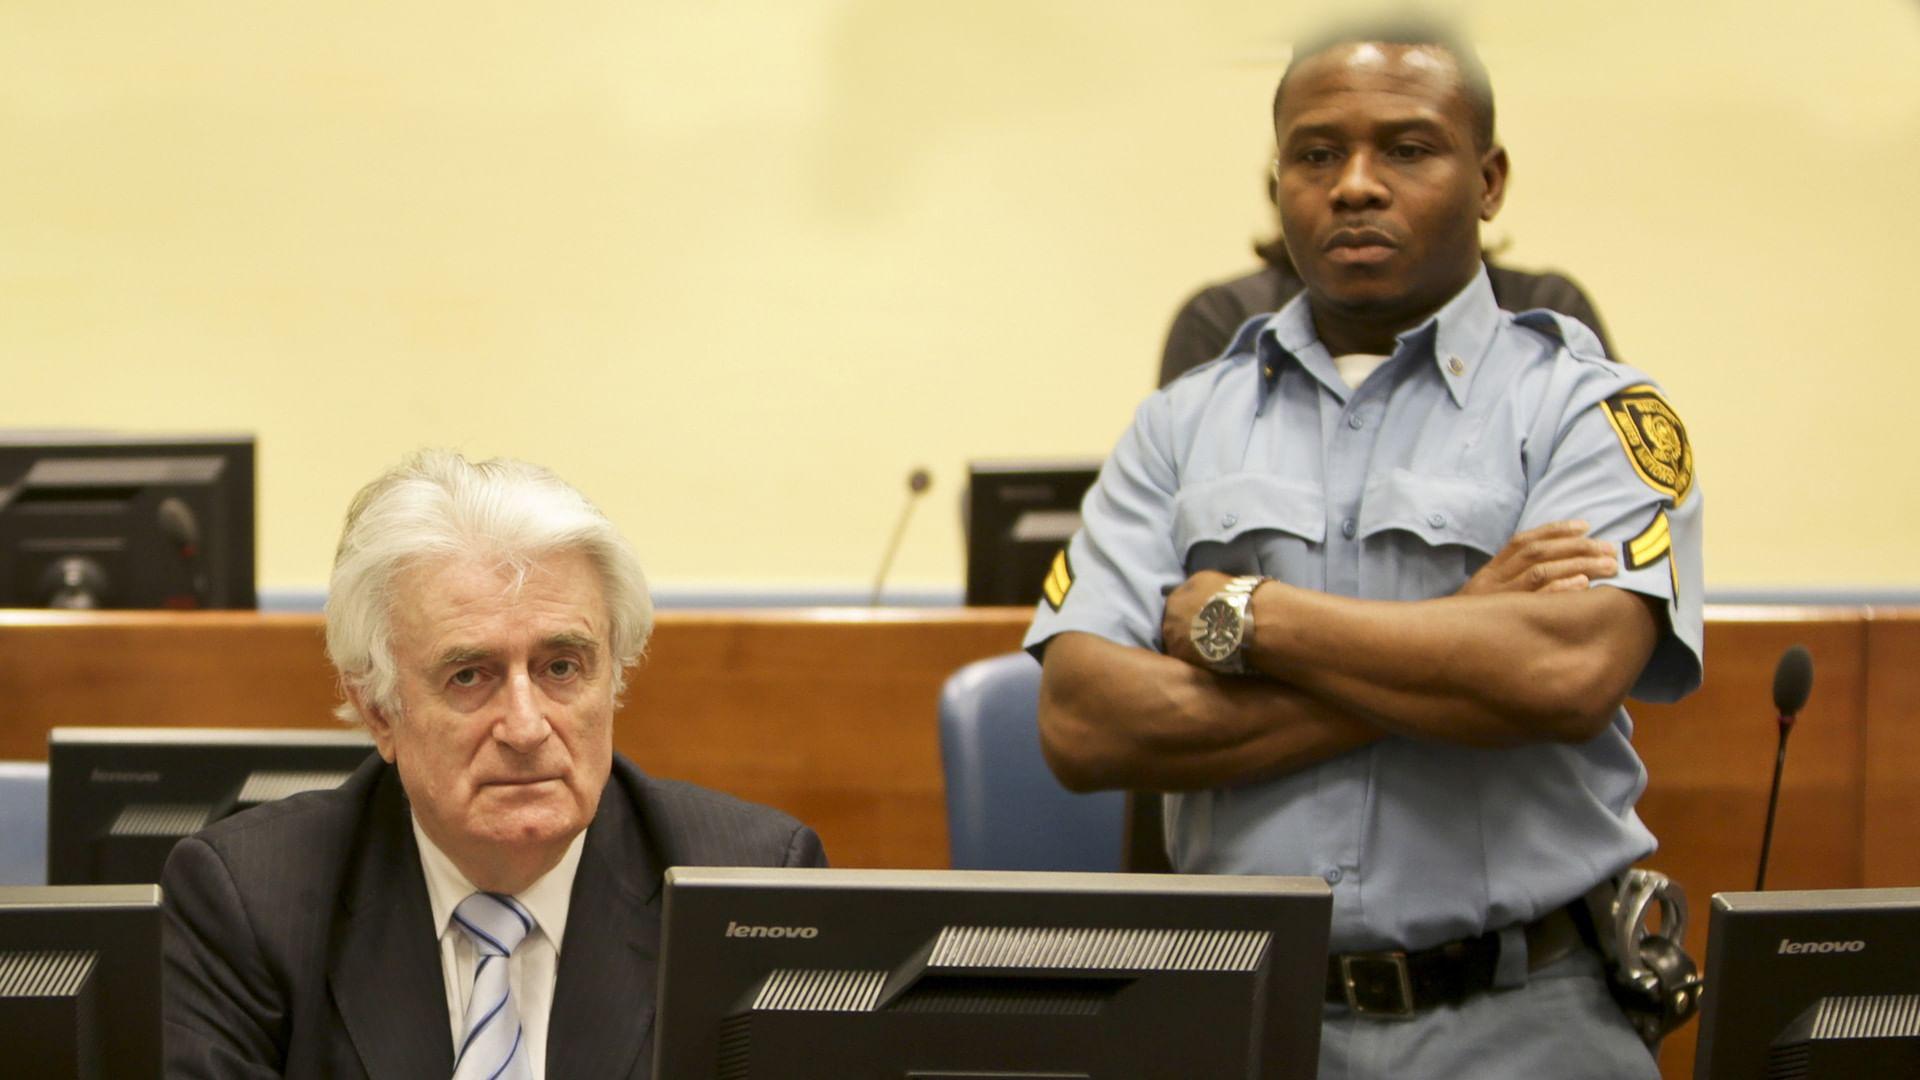 Ex-Yougoslavie - Les procès du Tribunal pénal international